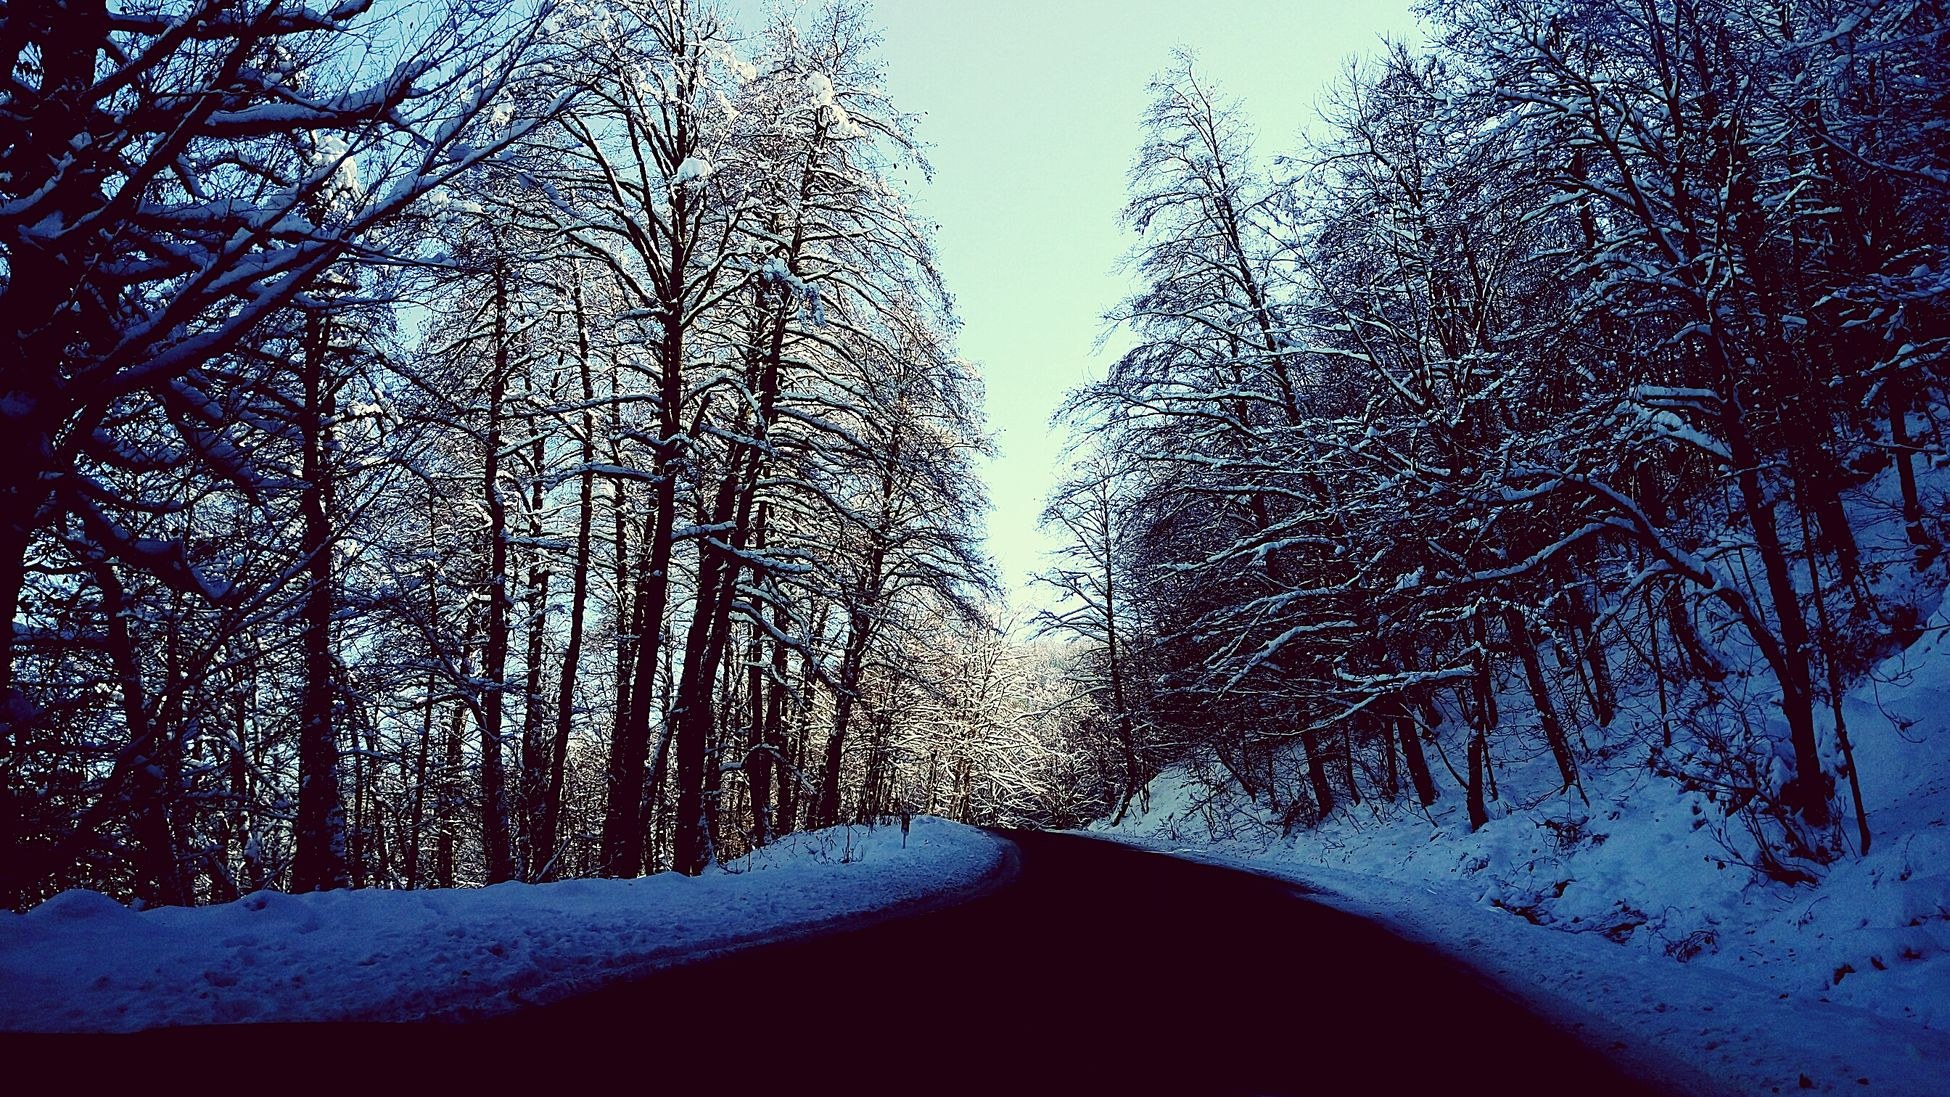 Asalem to Khalkhal road @ Talesh🙋 Guilan OR Gilan Iran♥ iran : Beauty In Nature Snow ❄ Jungle Heart Of Iran Snowy Trees Original Photography